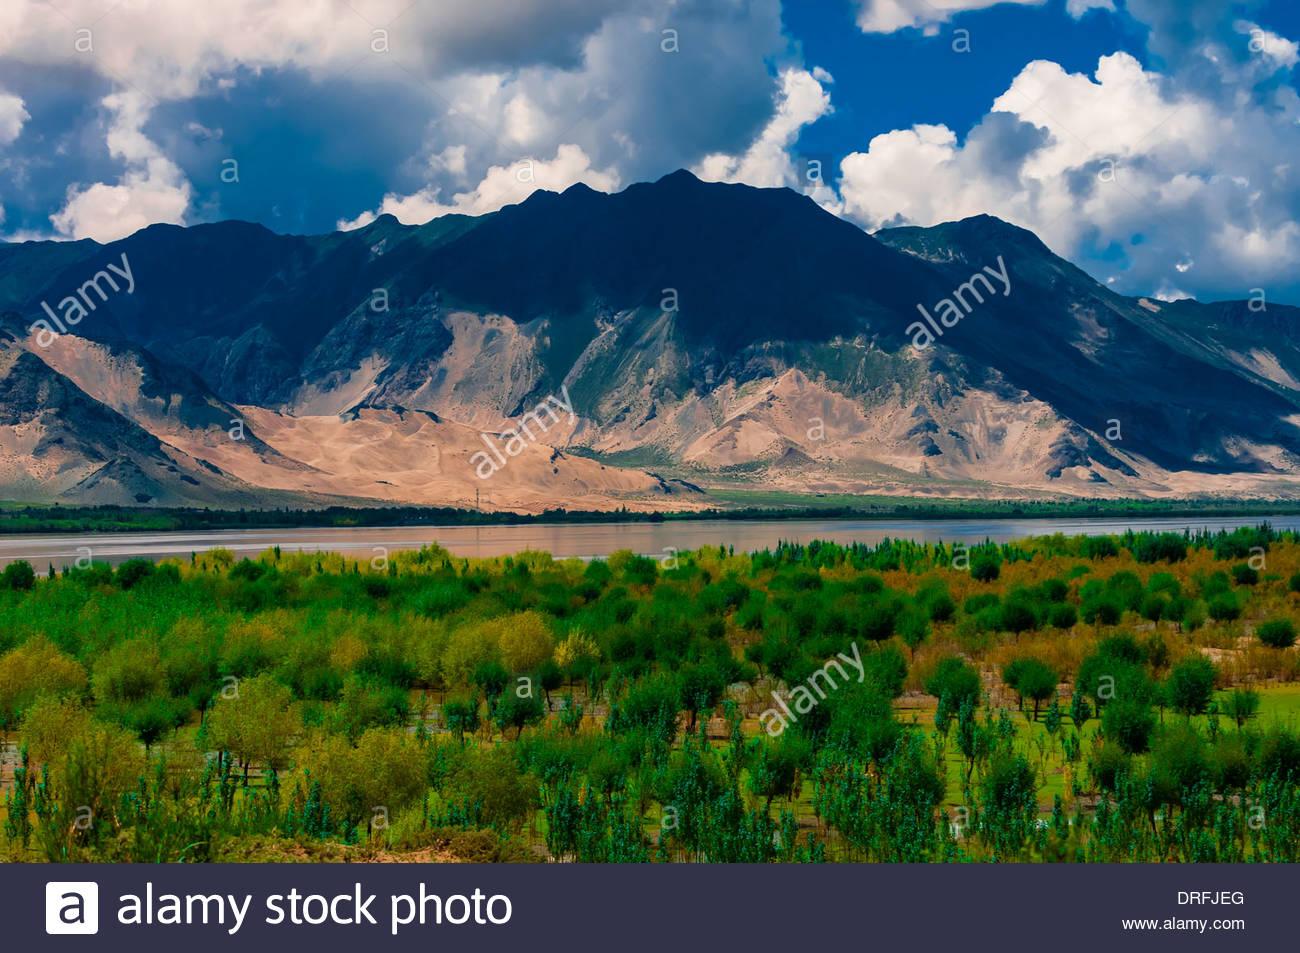 Nedong, Tibet (Xizang), China. - Stock Image